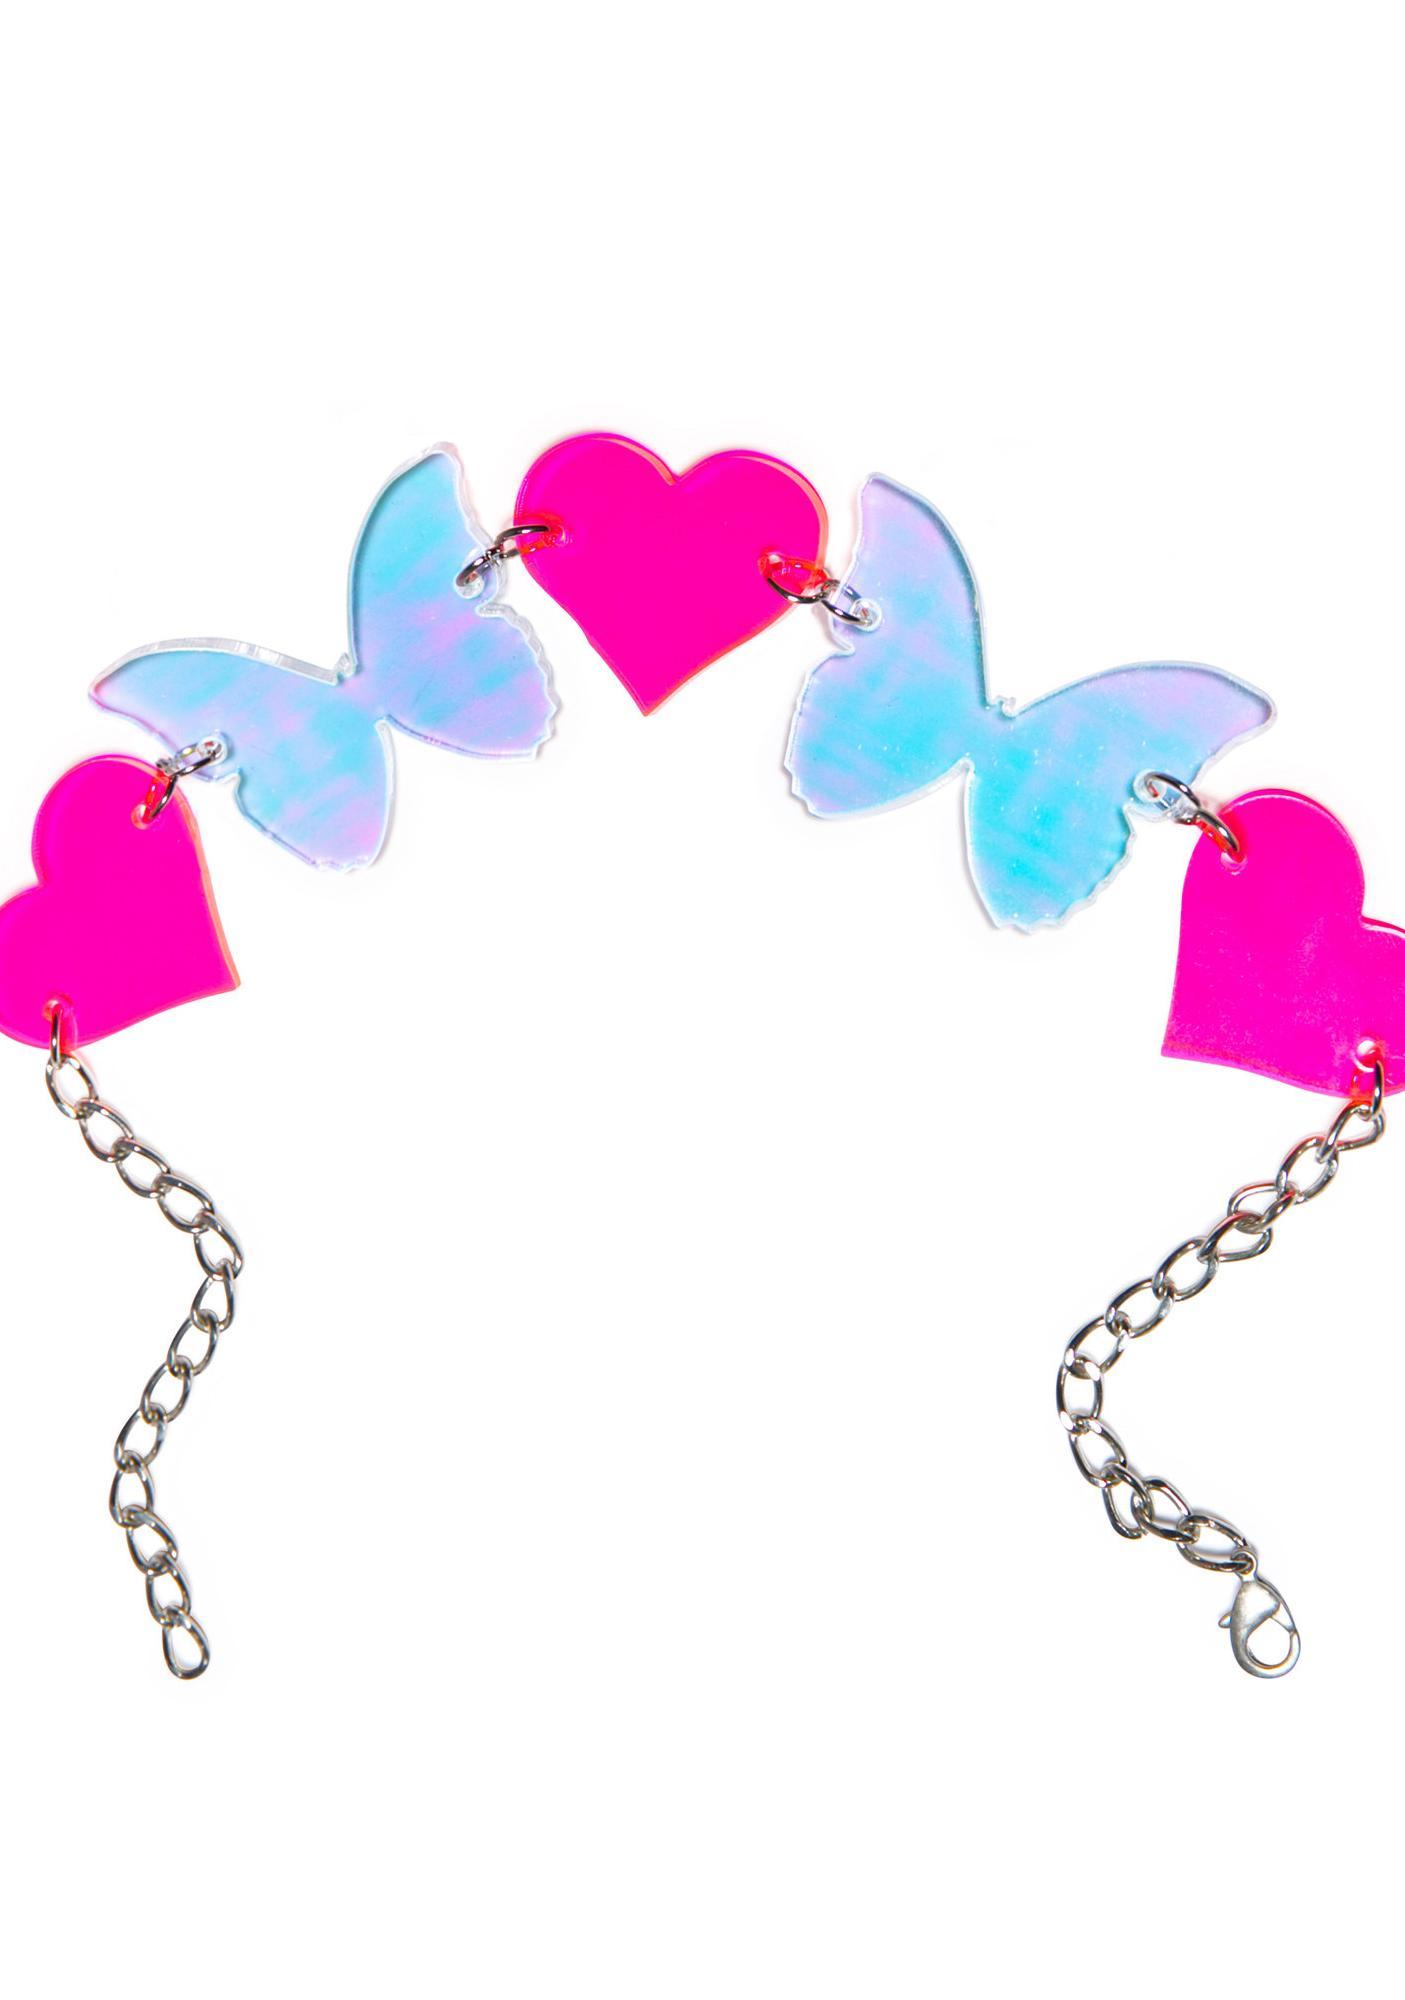 Marina Fini Butterfly Kisses Choker